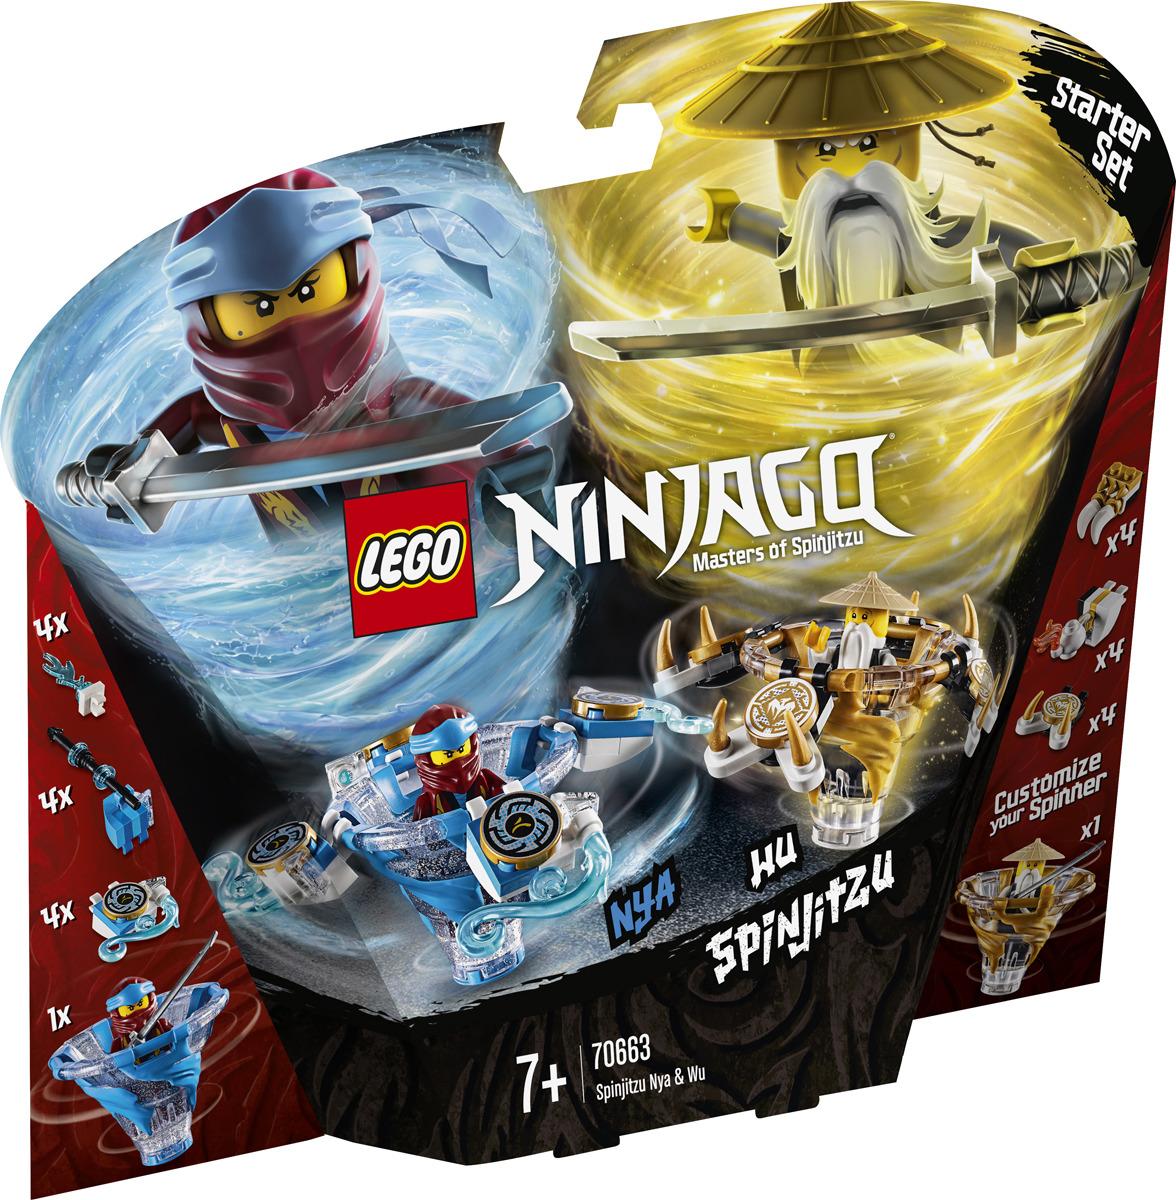 LEGO NINJAGO 70663 Ния и Ву мастера Кружитцу Конструктор lego ninjago битва гармадона и мастера ву 70608